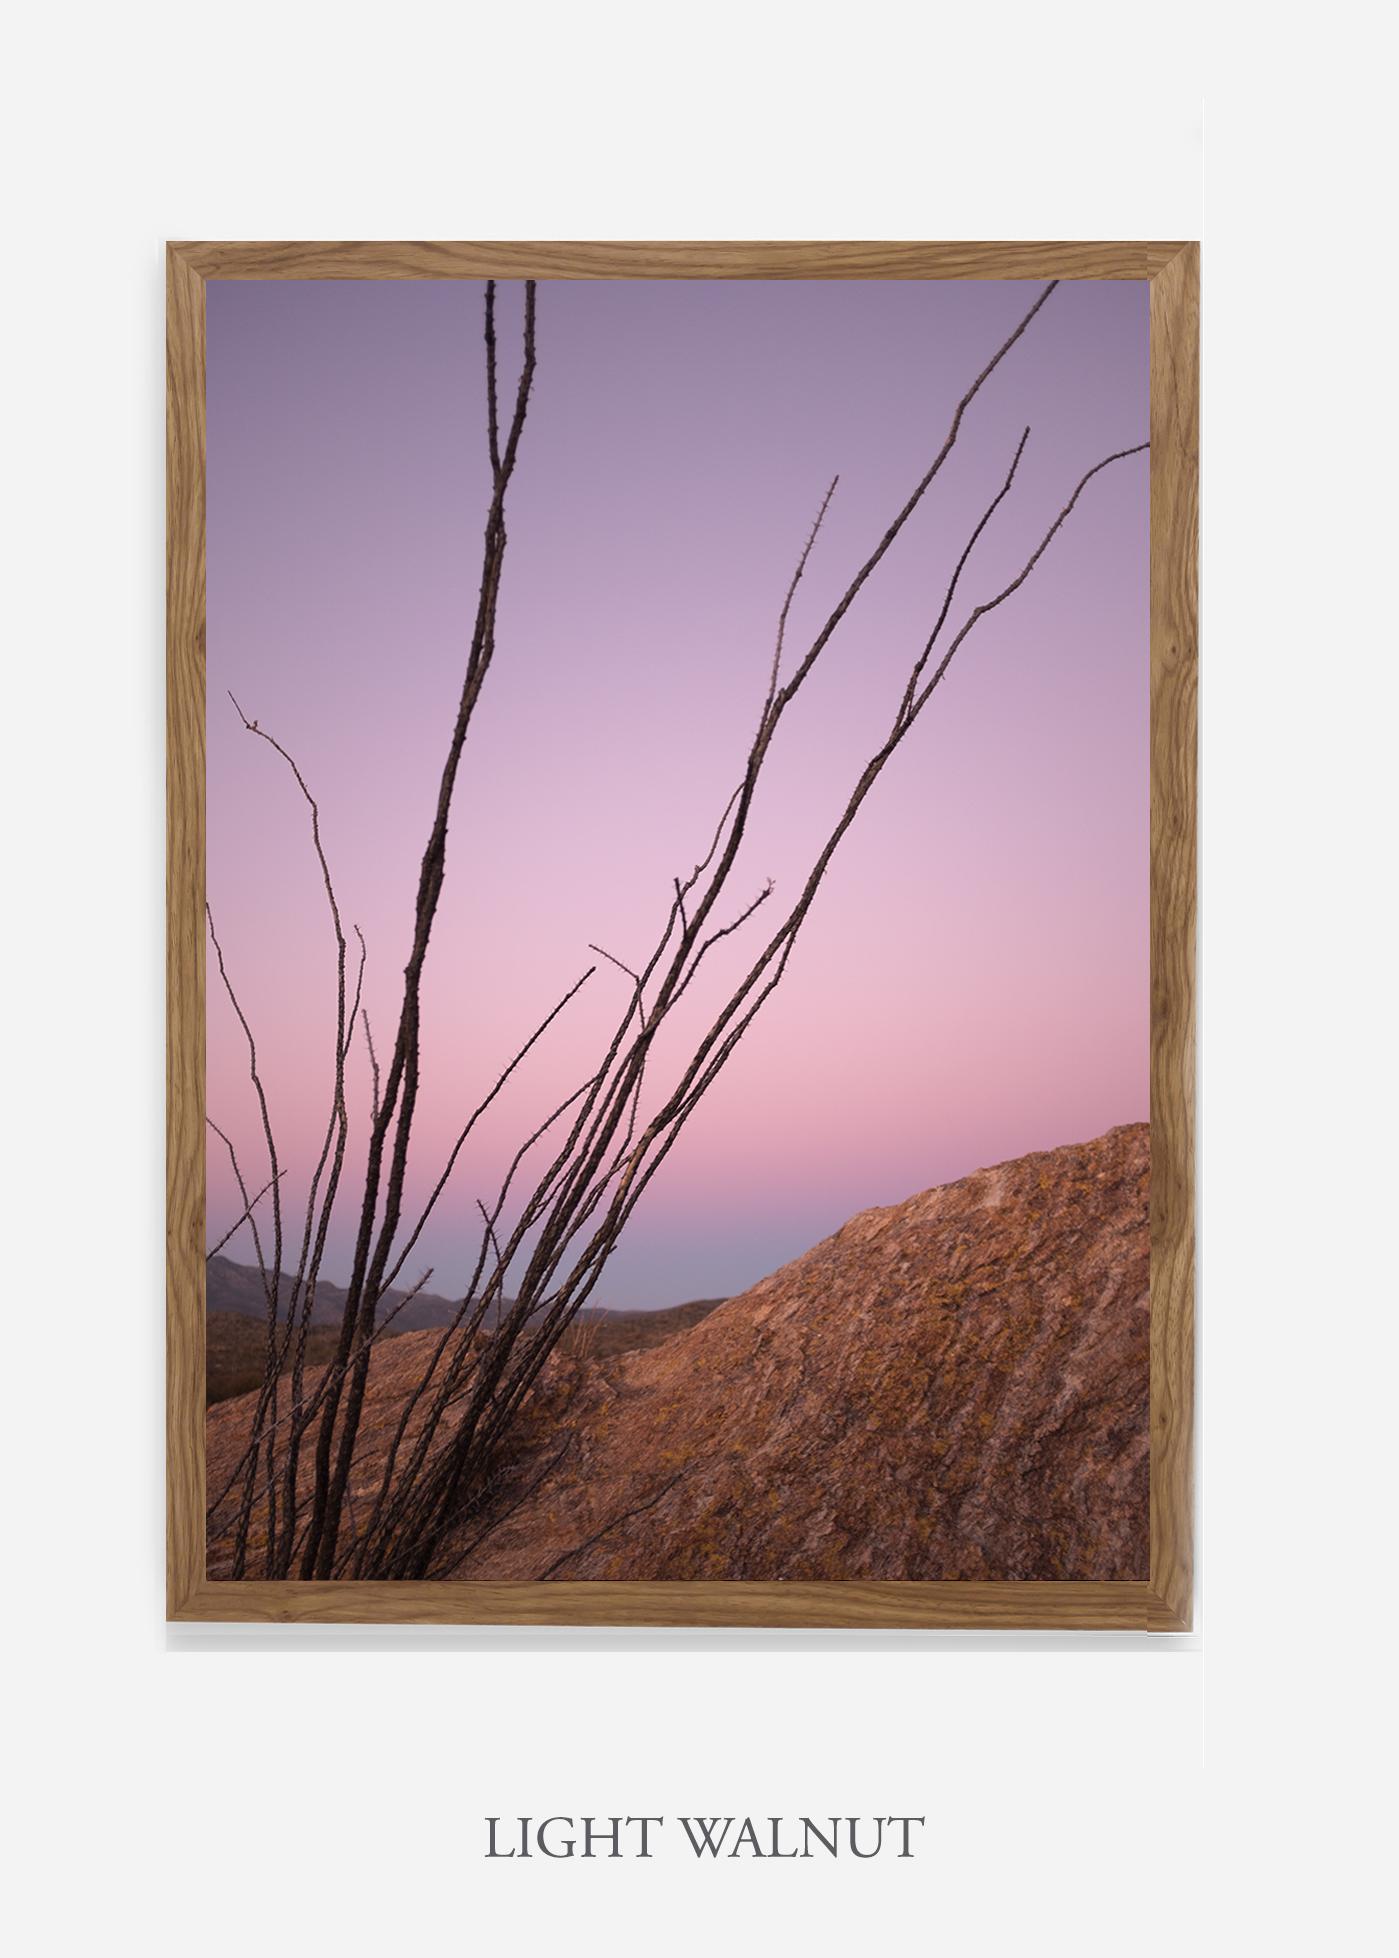 nomat-lightwalnutframe-saguaroNo.12-wildercalifornia-art-wallart-cactusprint-homedecor-prints-arizona-botanical-artwork-interiordesign.jpg